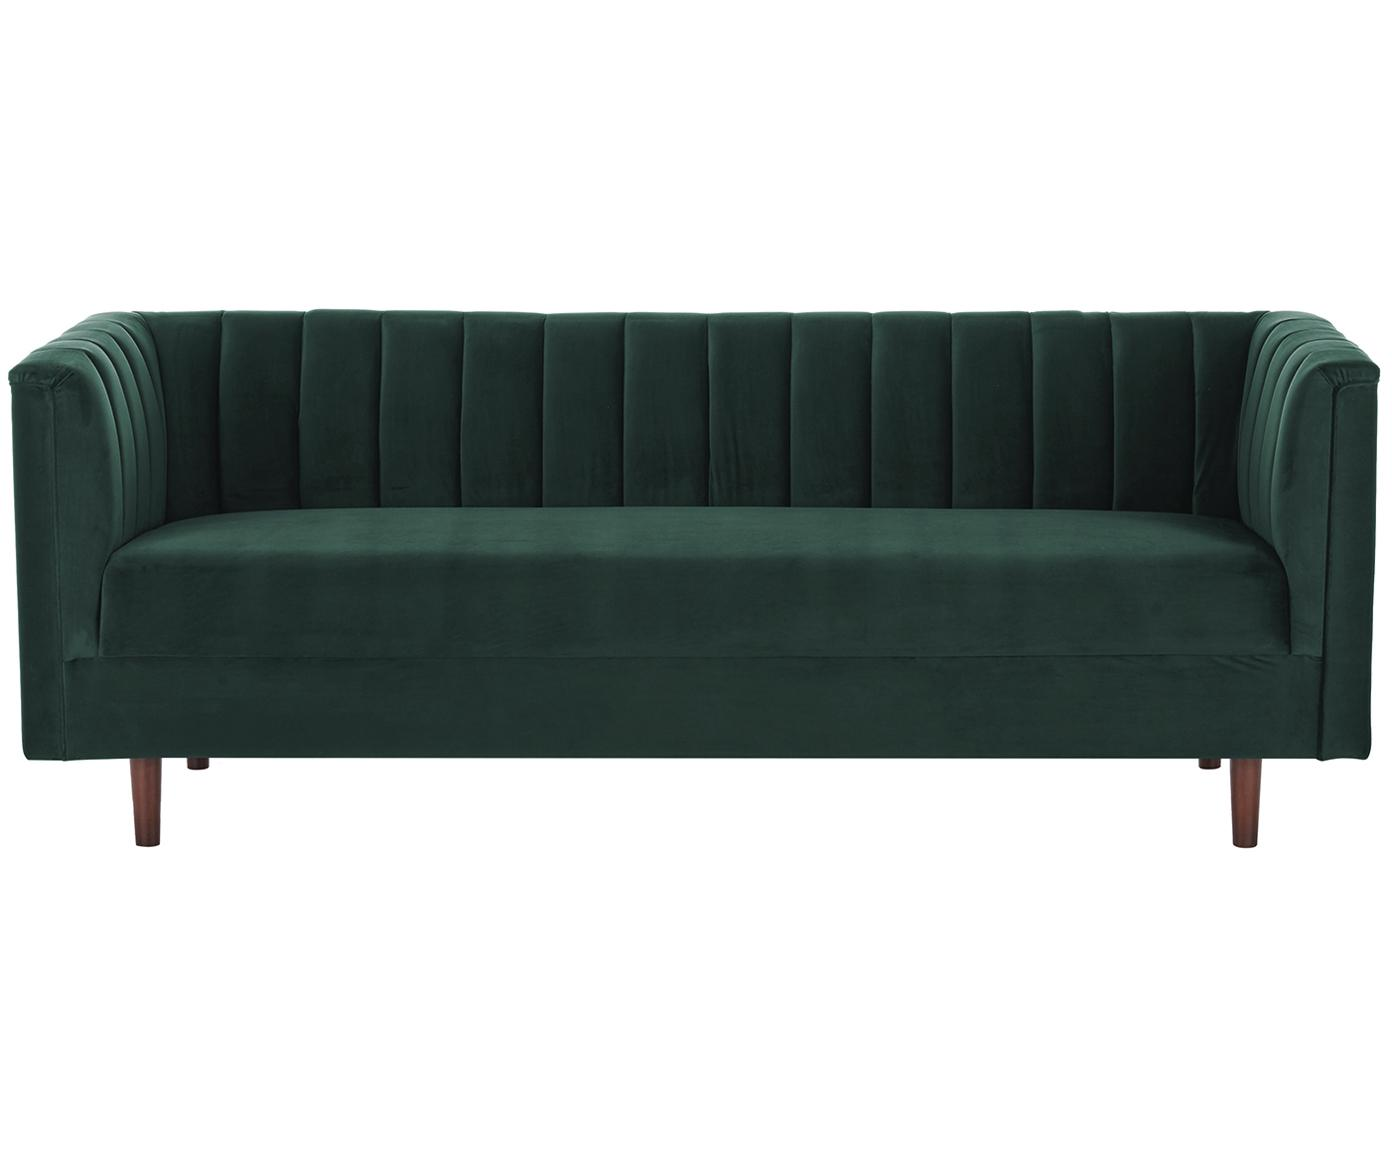 Samt-Sofa Paula (3-Sitzer), Bezug: Samt (Polyester) 28.000 S, Gestell: Kiefernholz, Samt Dunkelgrün, 199 x 77 cm